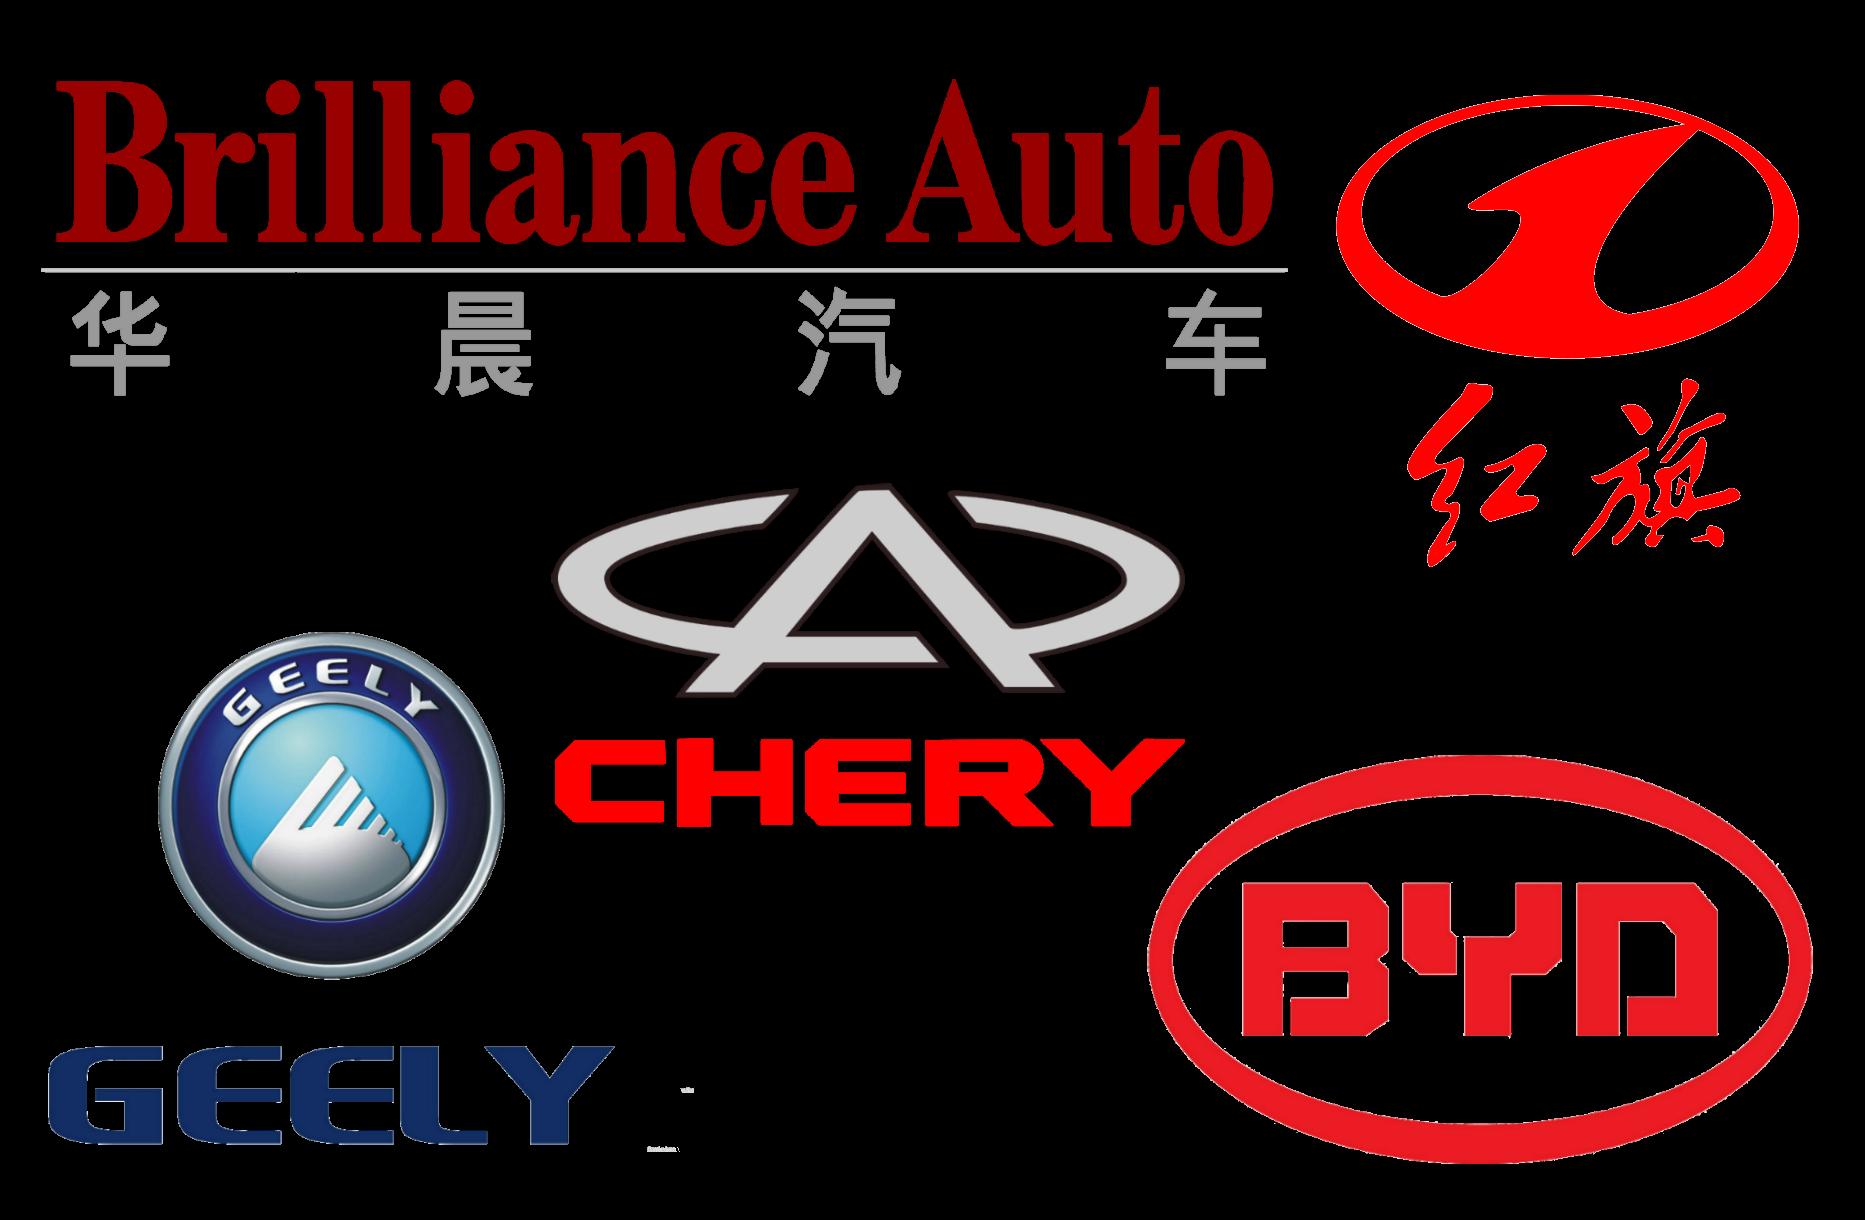 5 Perusahaan Otomotif Asal Cina yang Mendunia ...